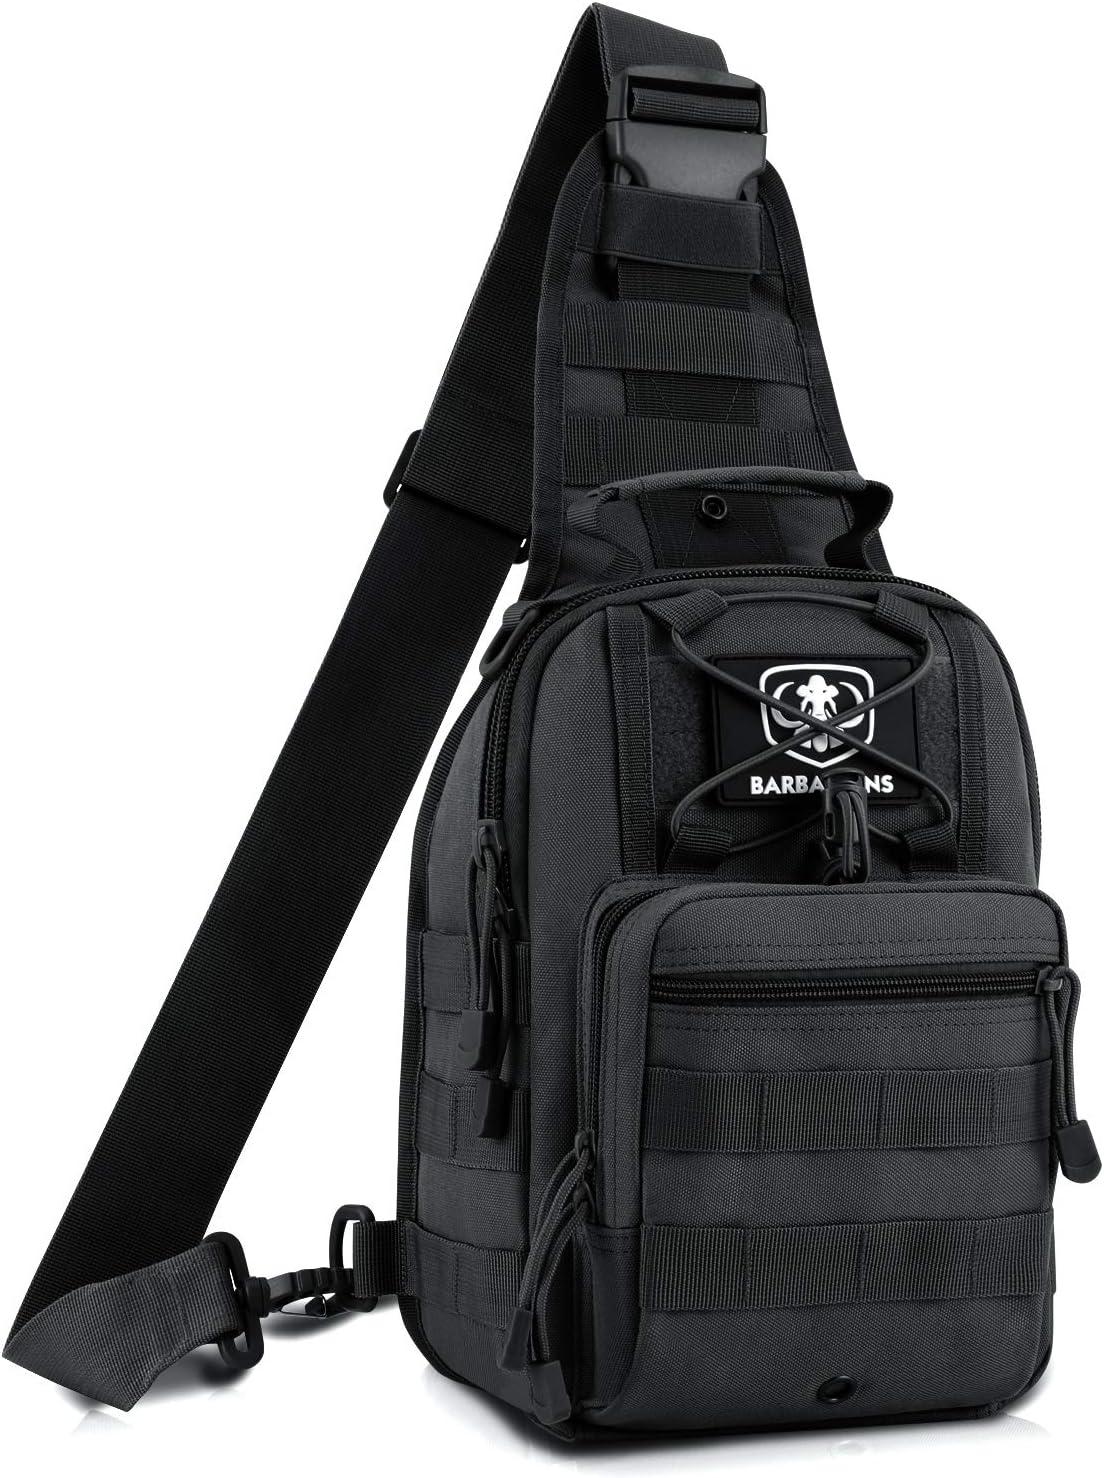 Tactical Sling Bag Pack Bárbaros Militar Bolsa de Hombro Satchel, Gama Molle Bolsa Mochila Mochila, Negro: Amazon.es: Deportes y aire libre